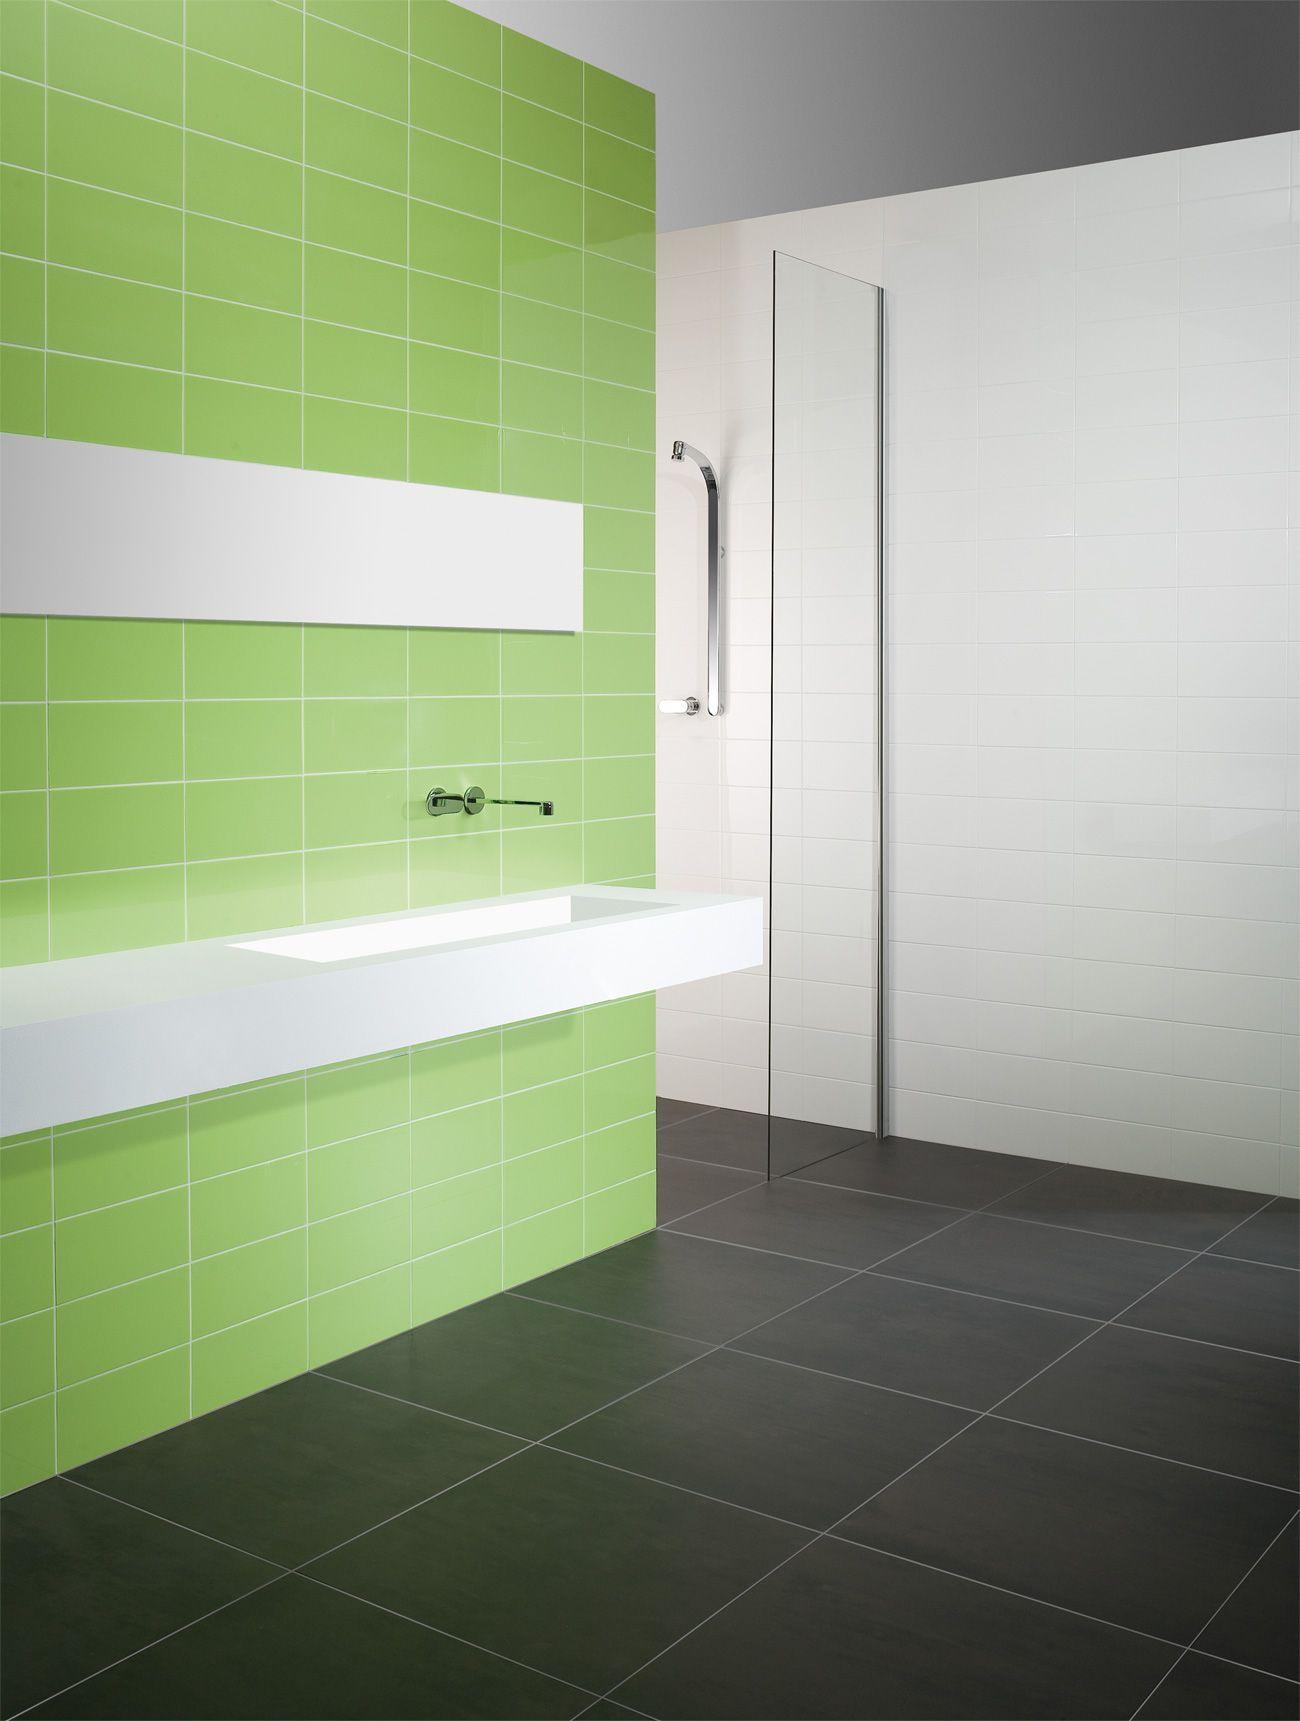 Mosa Wall Tiles In 2019 Restroom Design Tiles Room Tiles